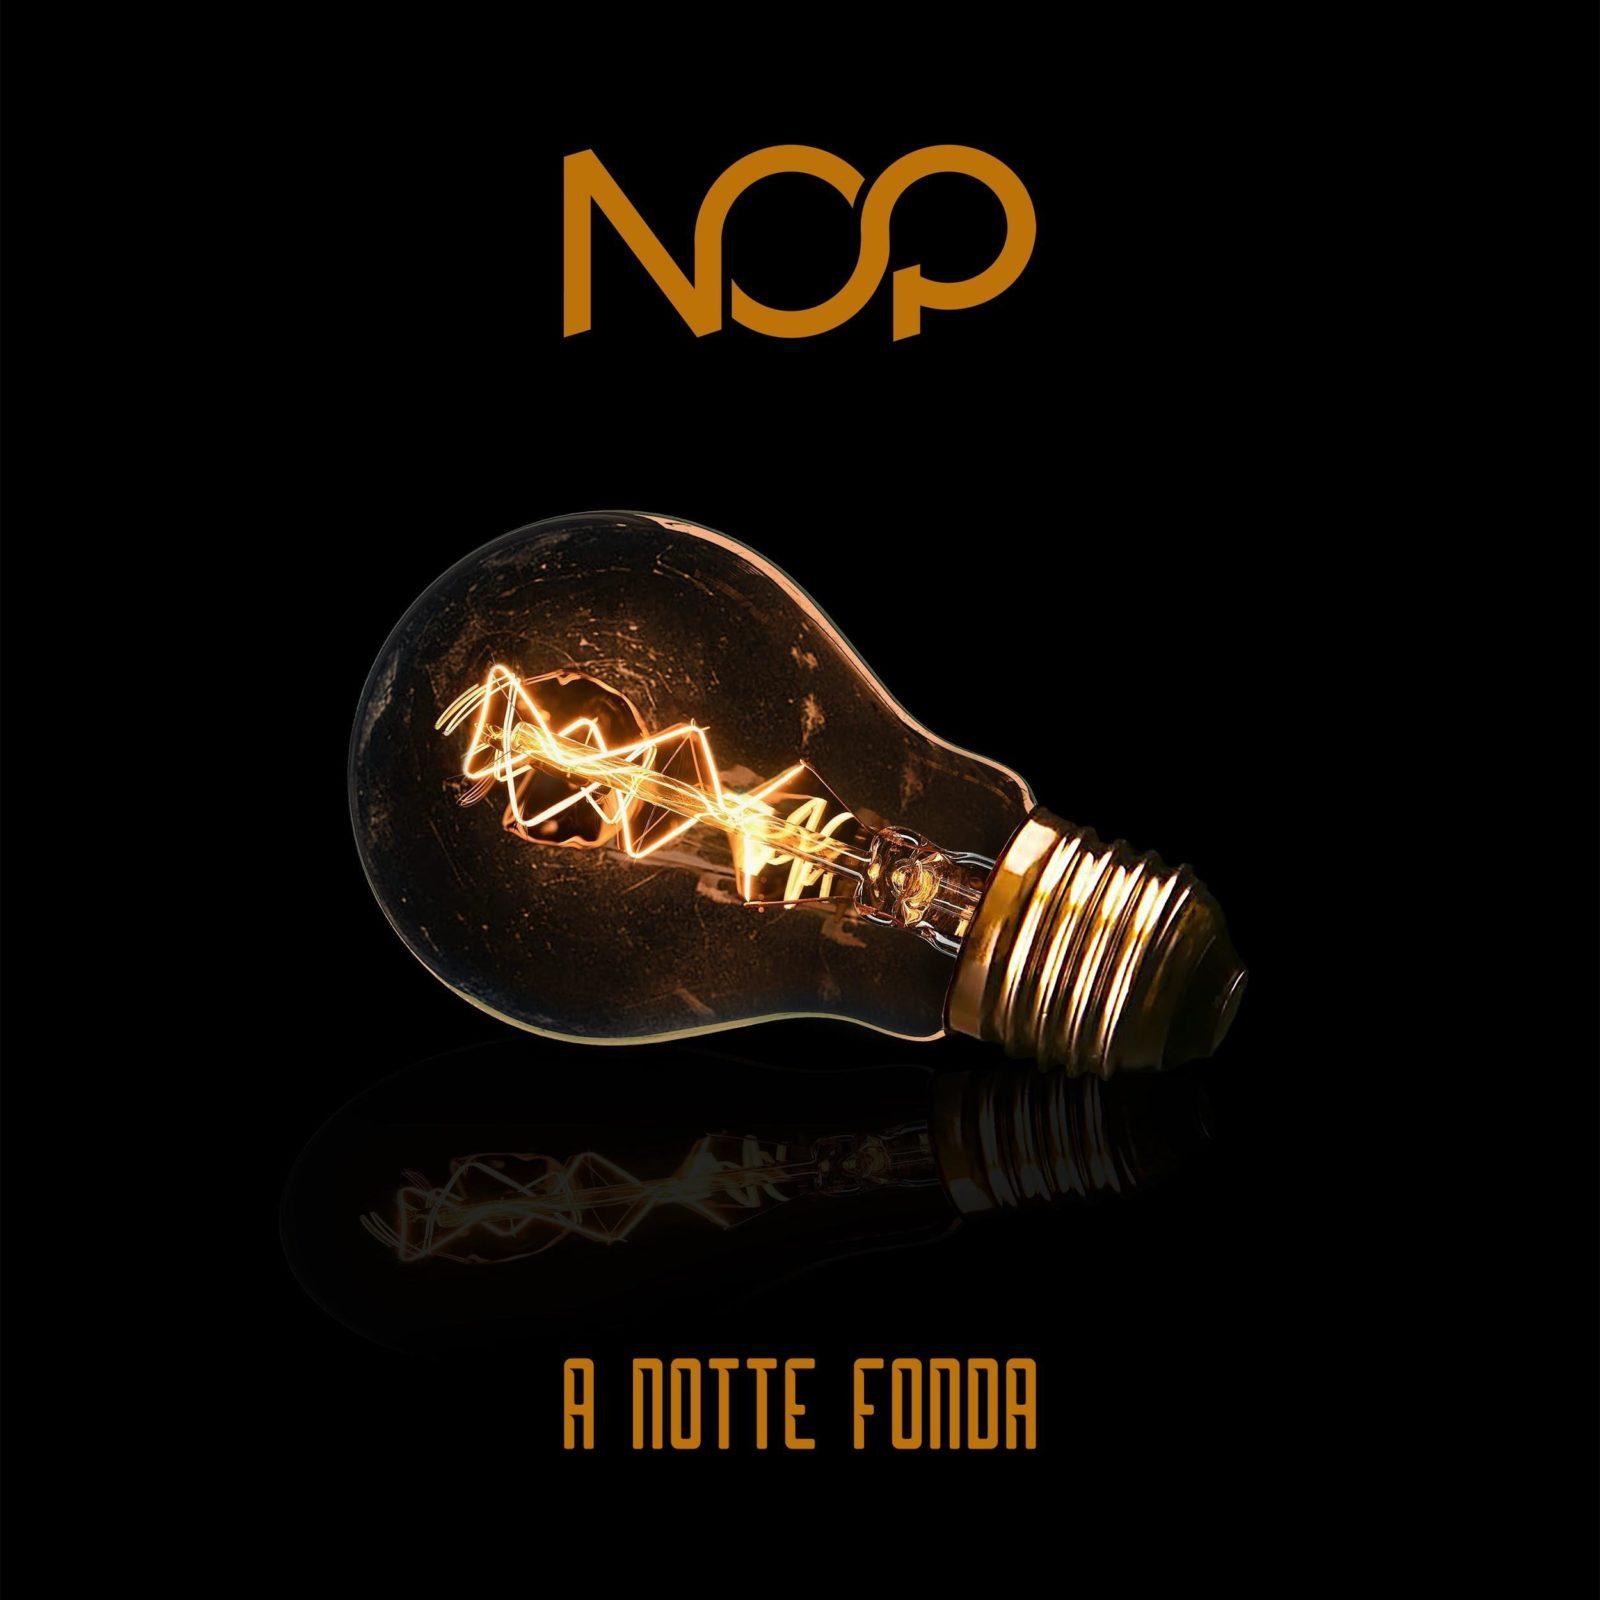 nopcover